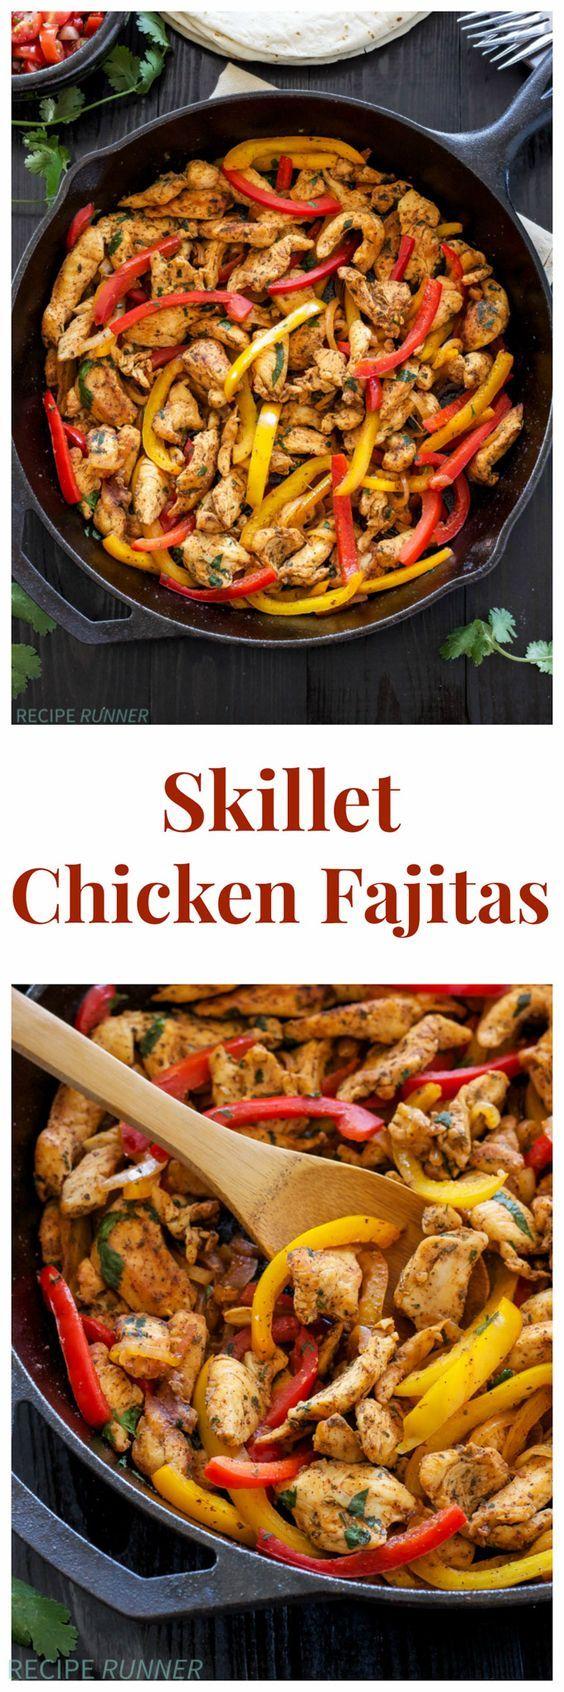 Skillet Chicken Fajitas | Quick, easy, gluten free, & paleo skillet chicken fajitas are perfect for busy nights!